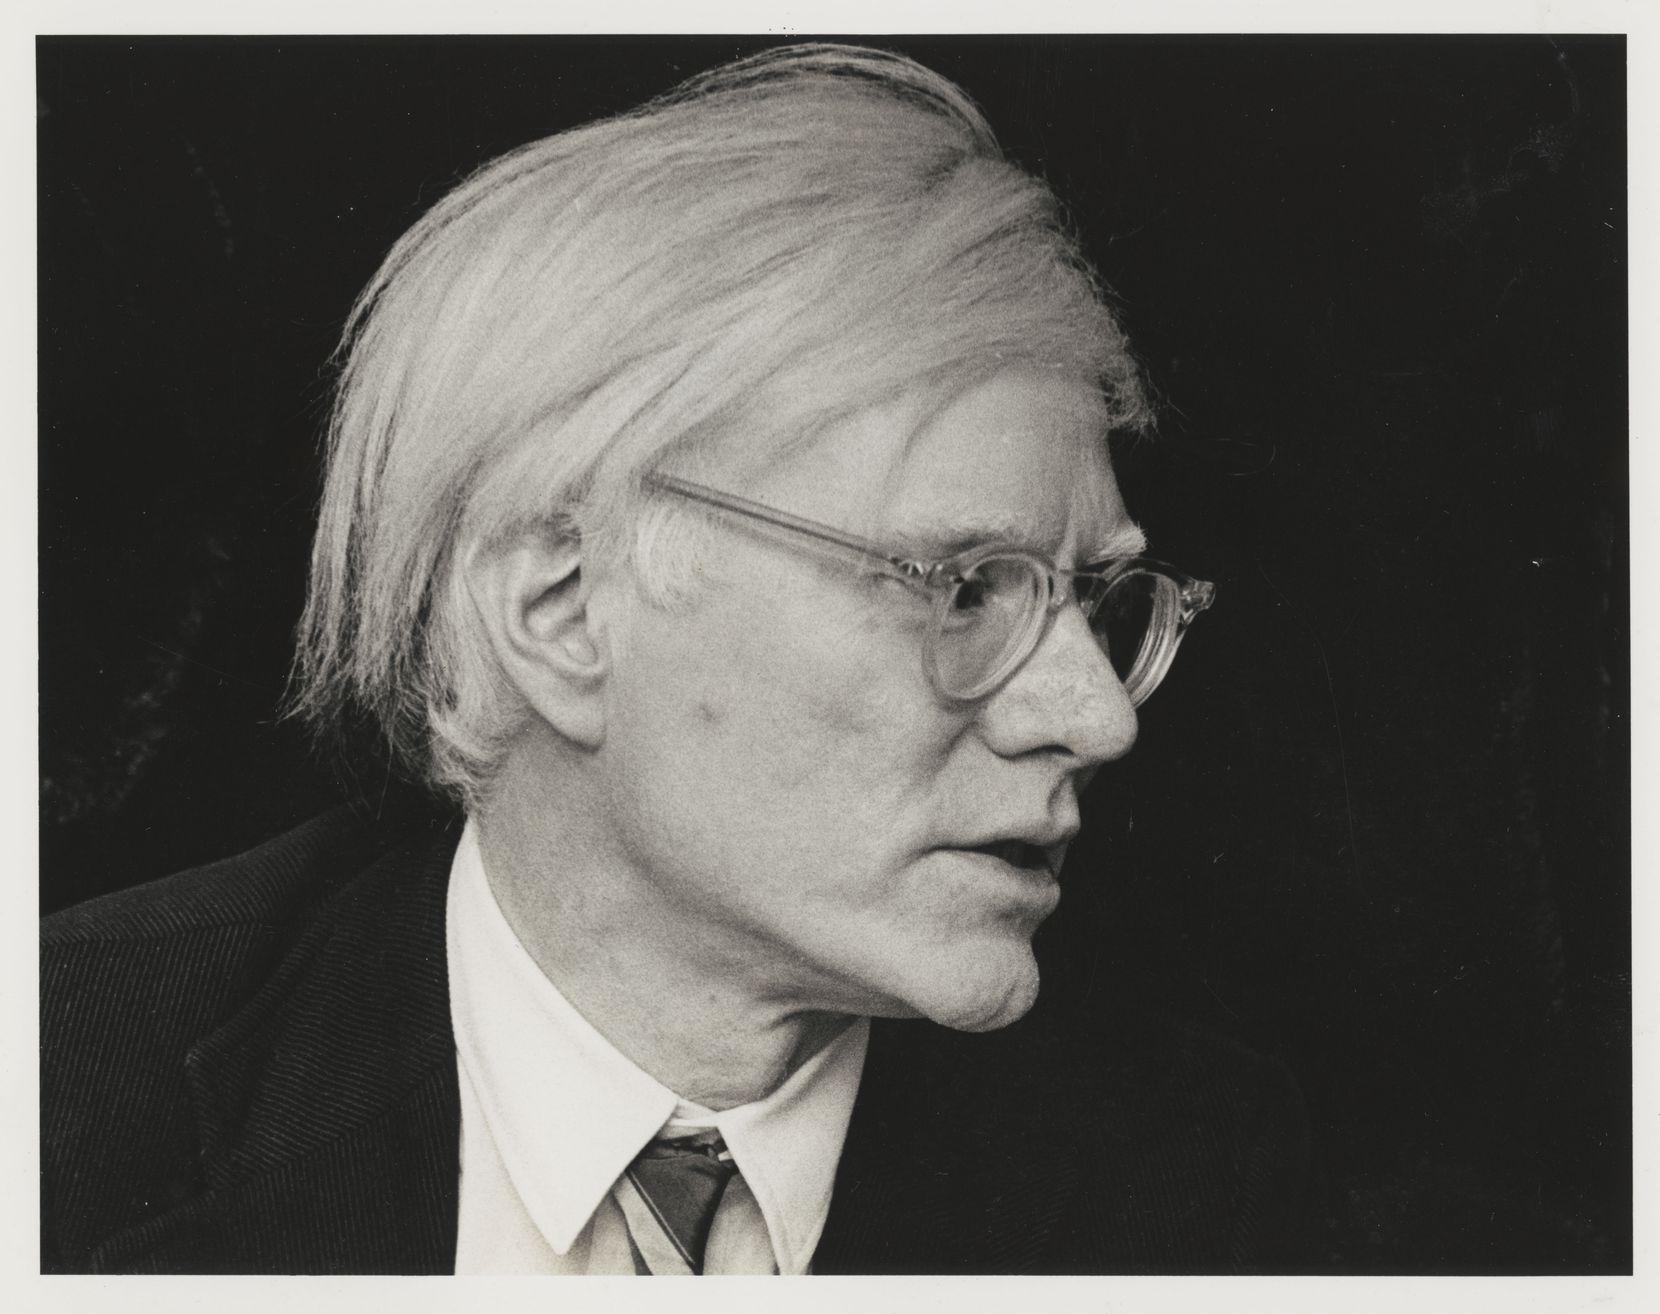 Artist Andy Warhol, Nov. 1977.